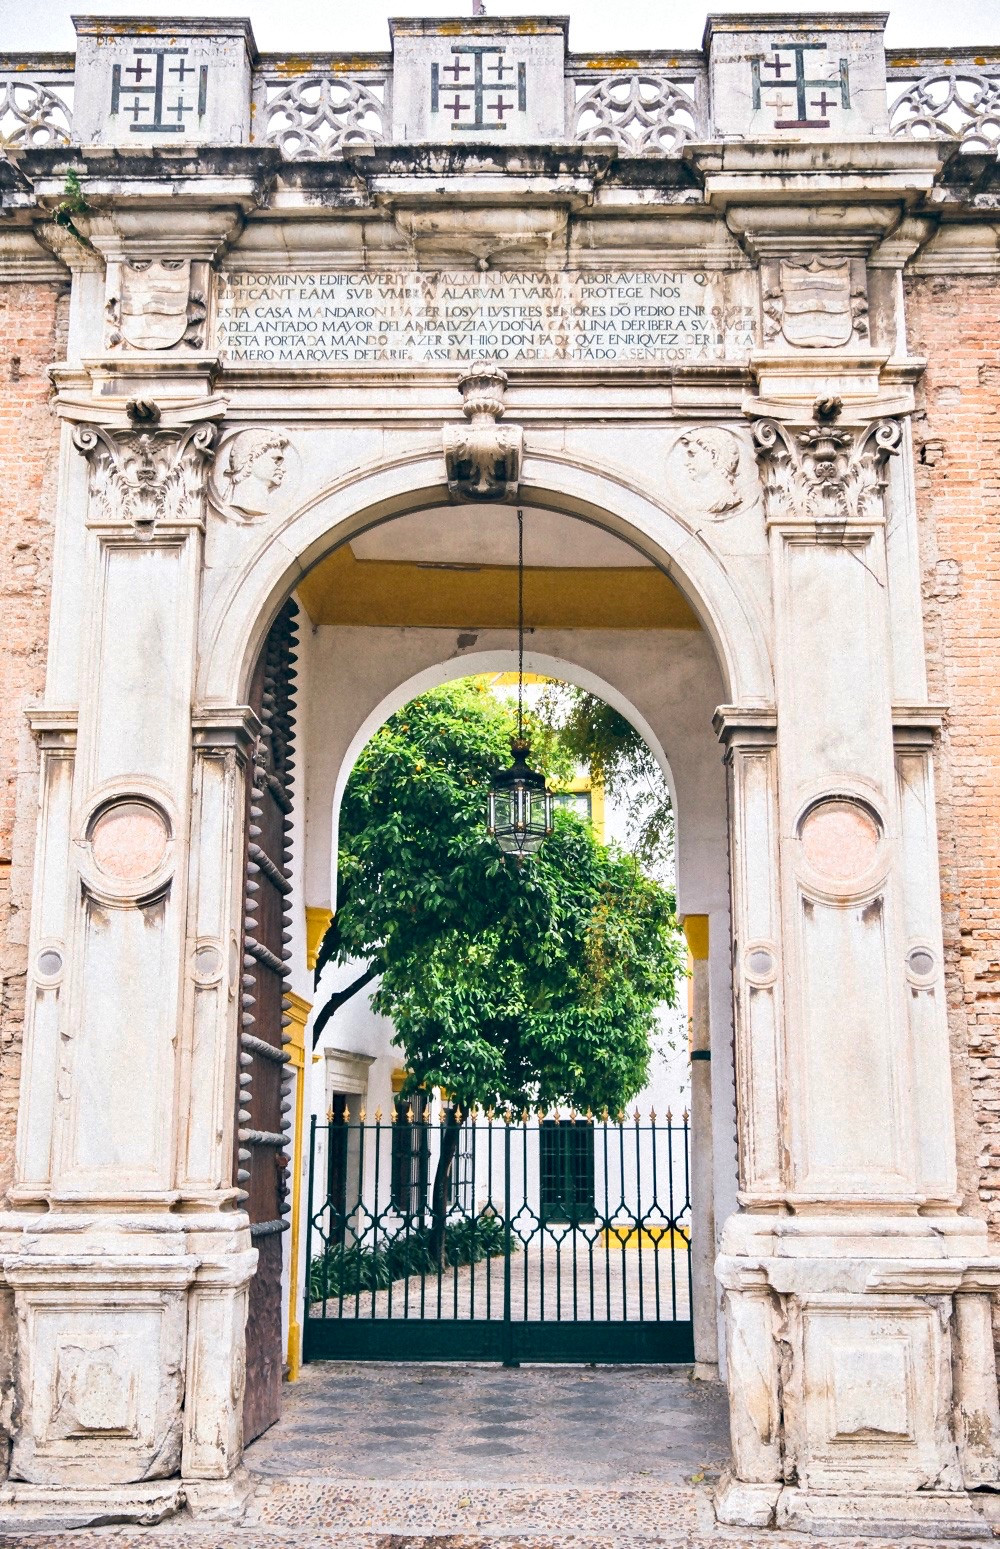 the Renaissance gate, which is the entrance to the Casa de Pilatos